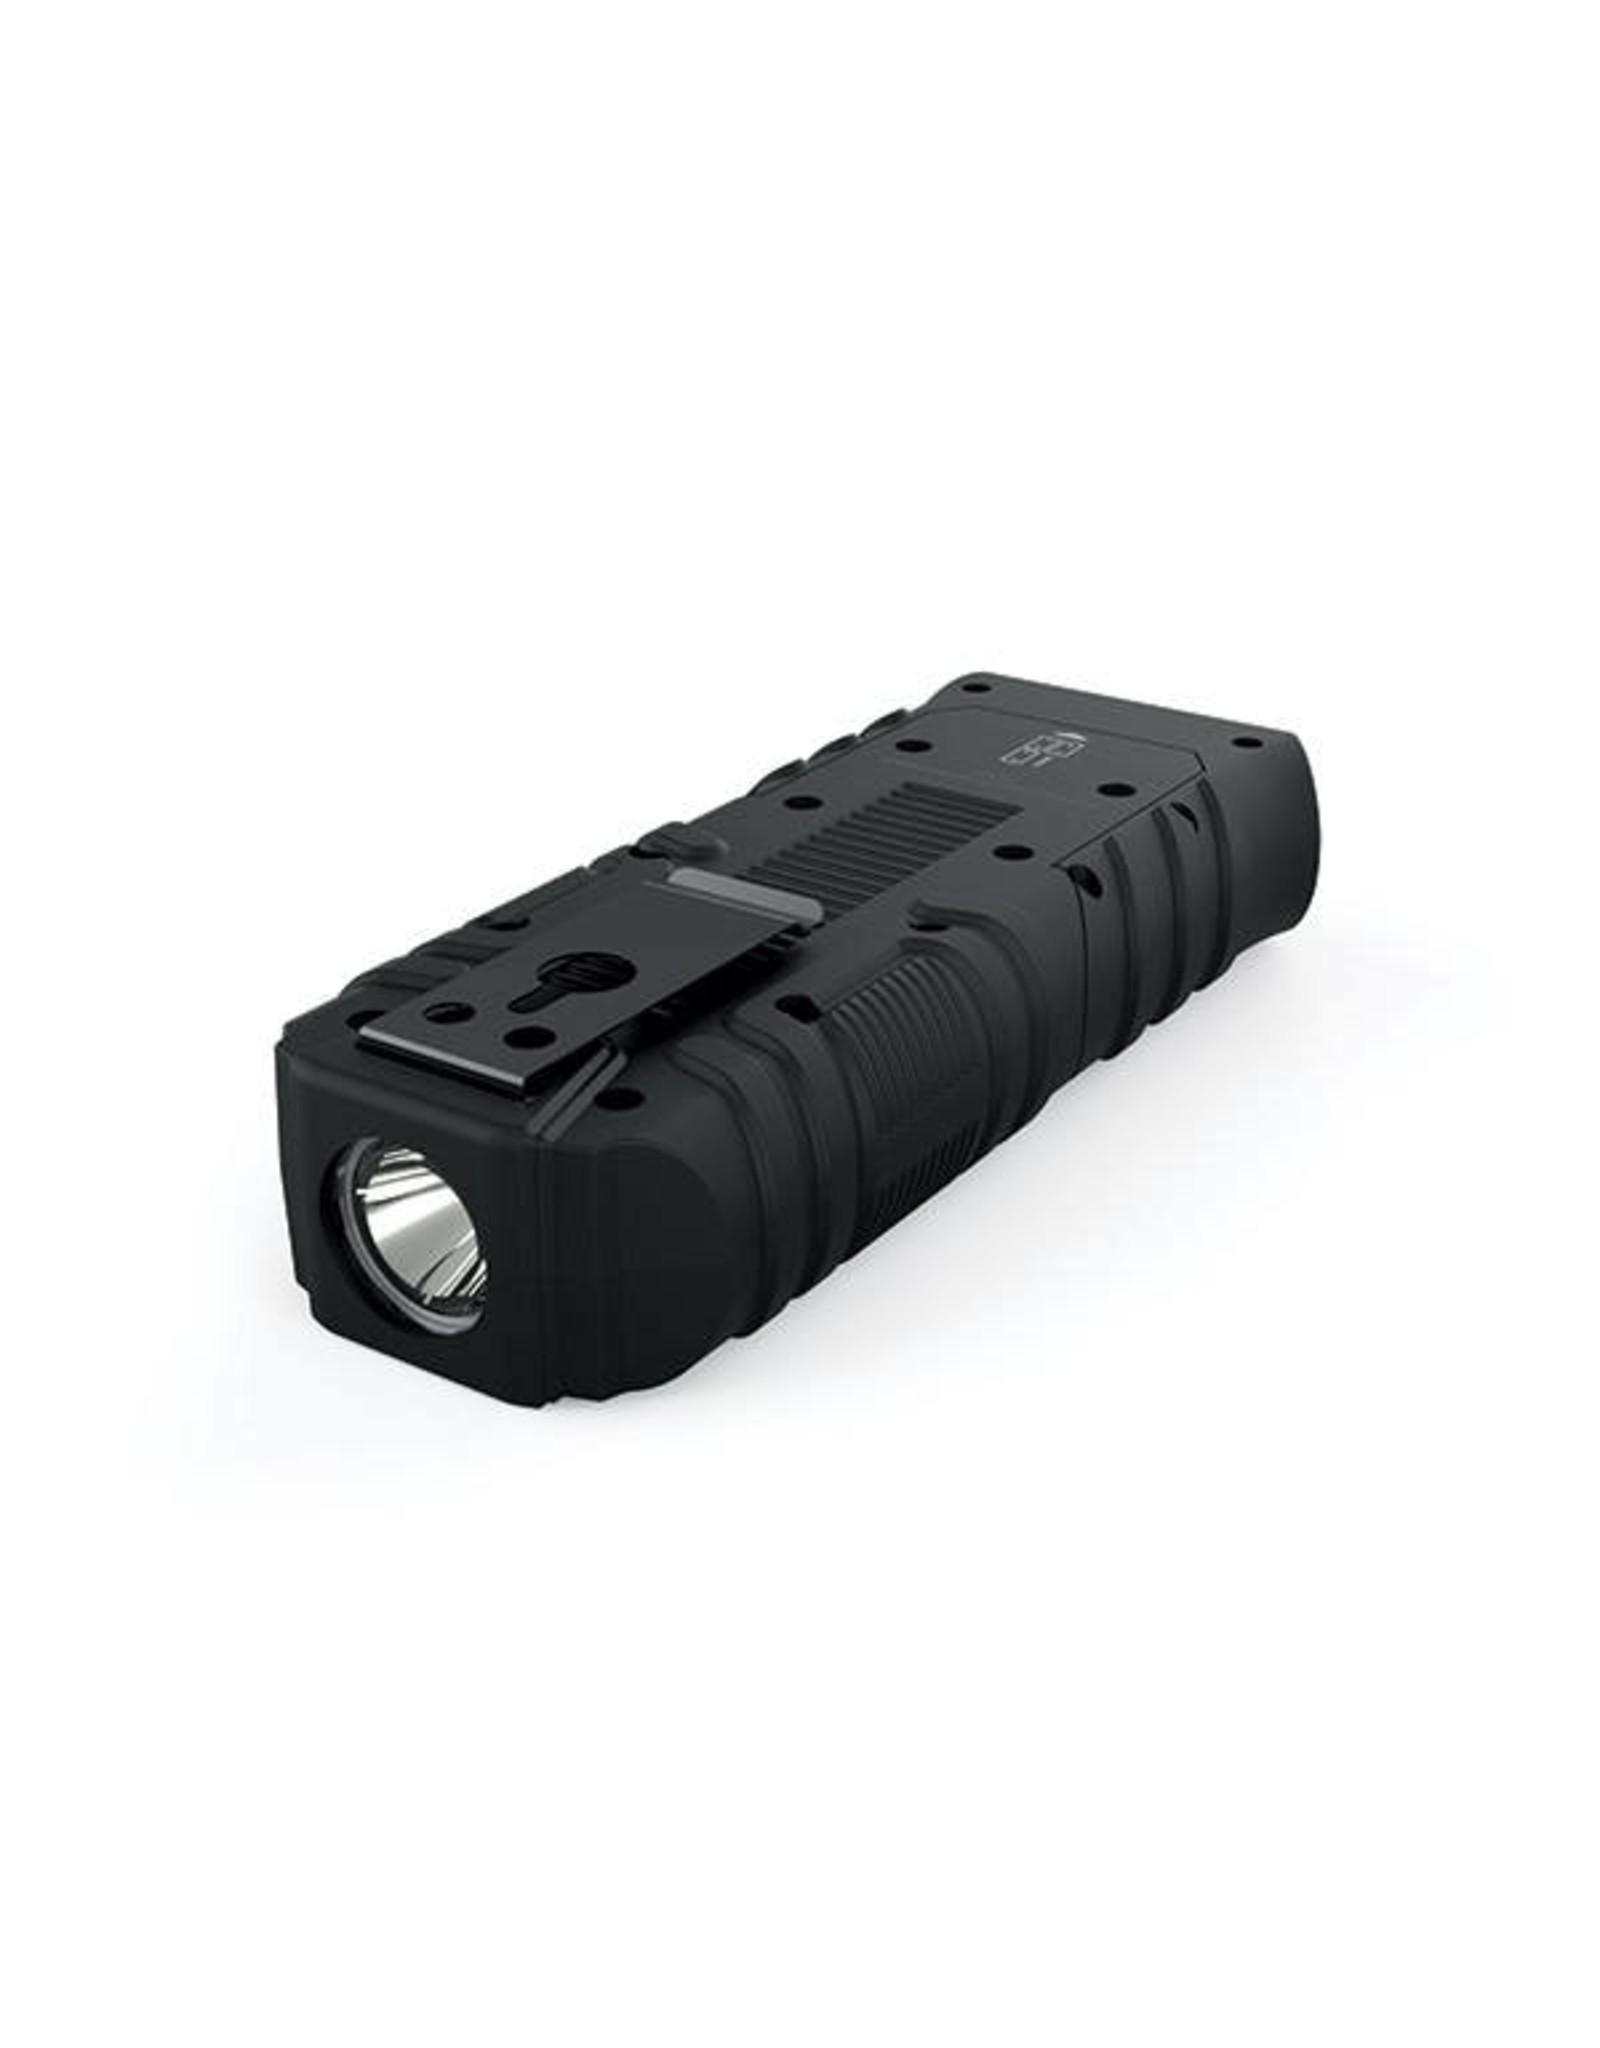 Nebo Armor 3 Work & Spot Light / Flashlight